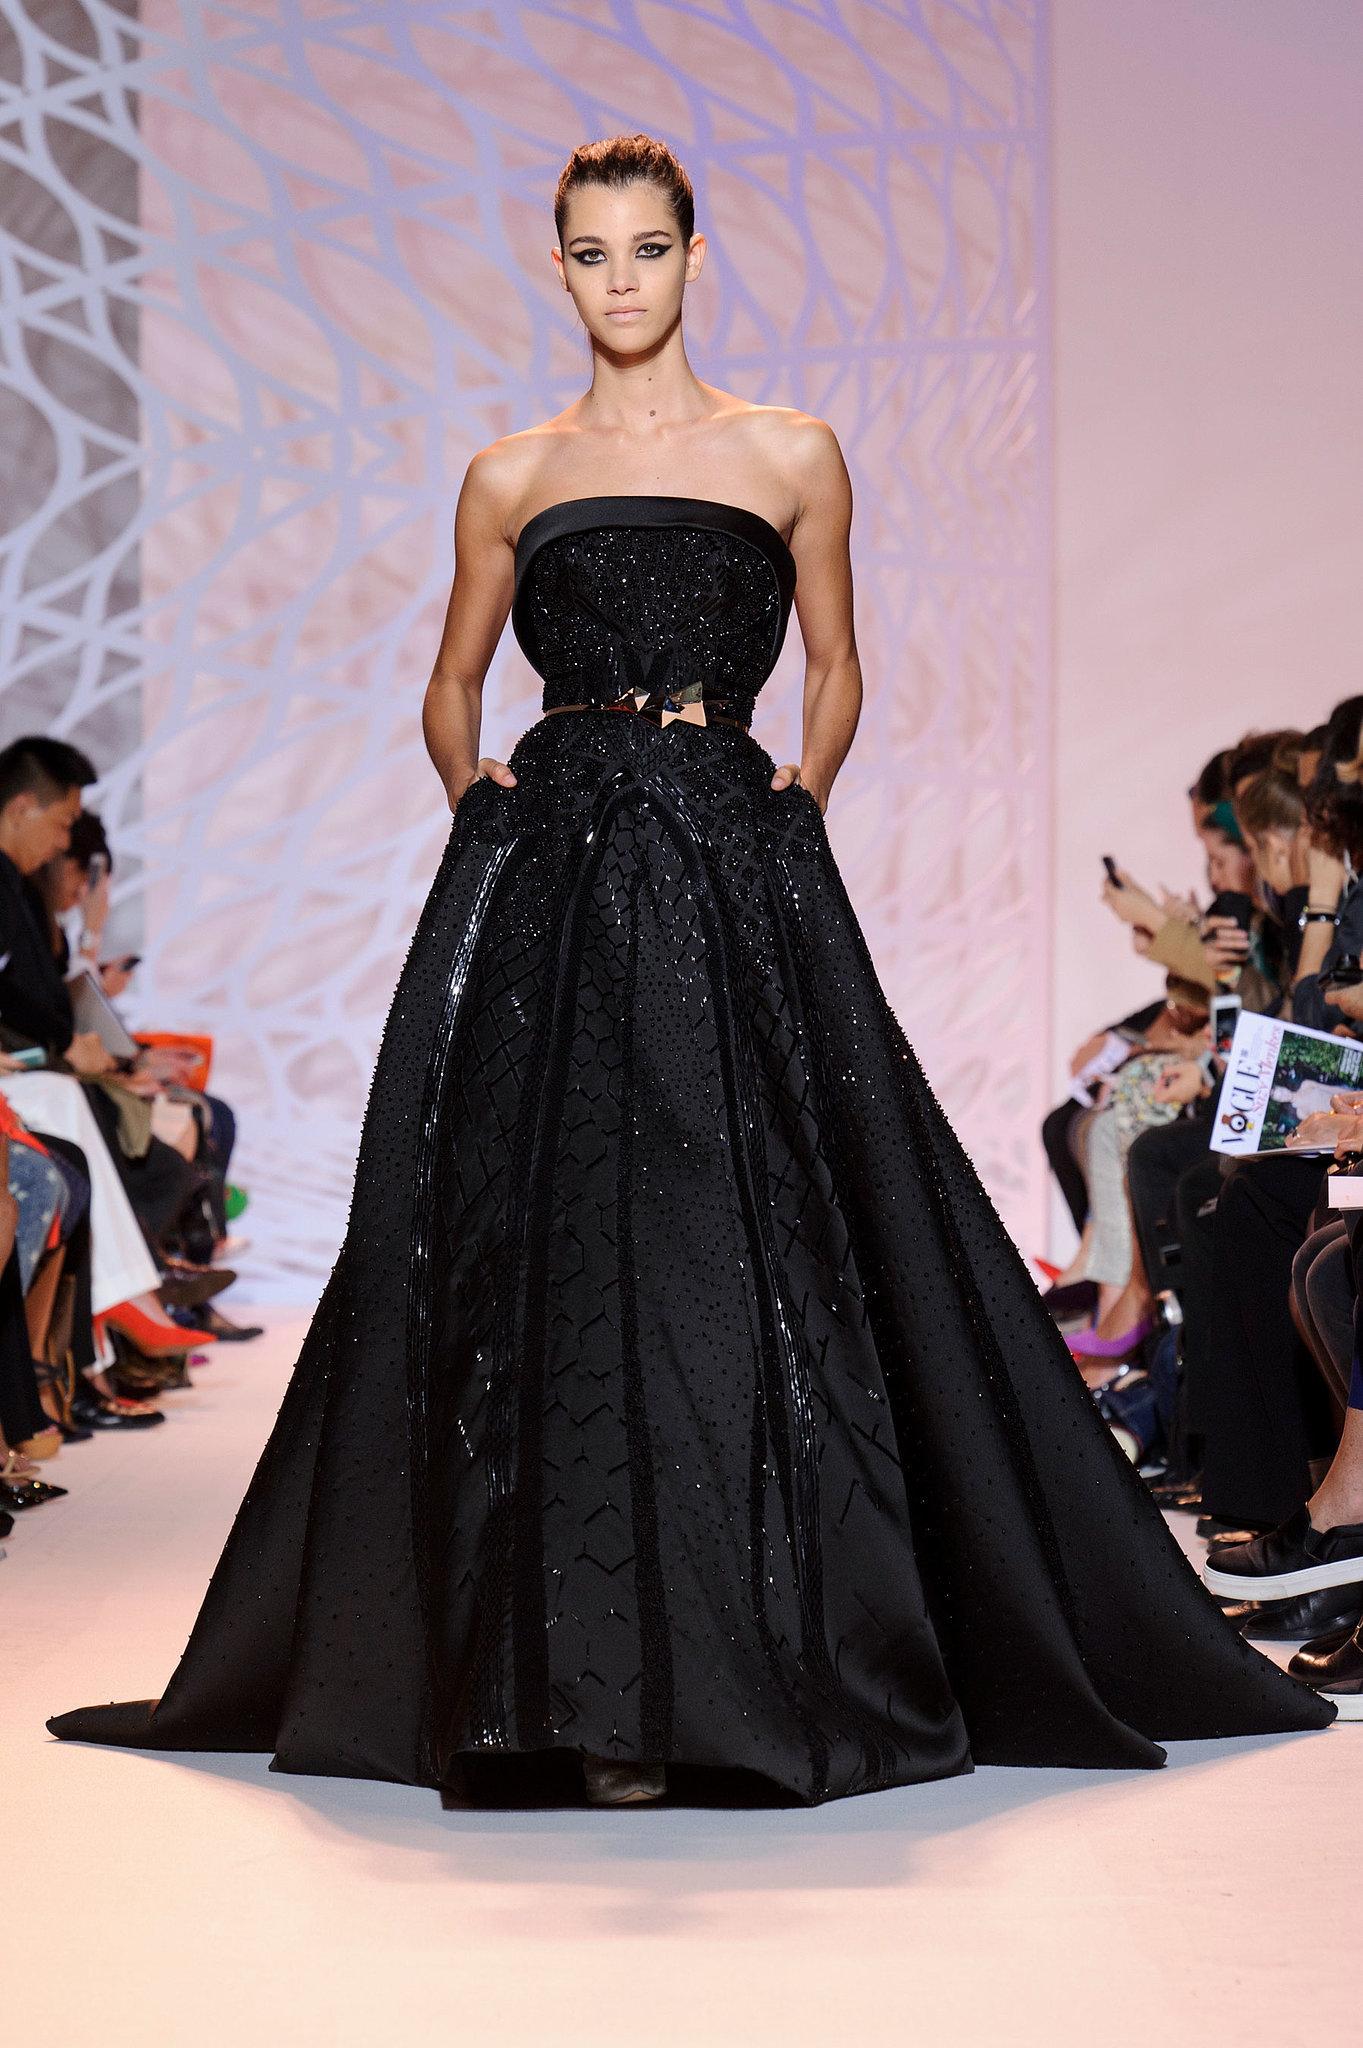 Zuhair-Murad-Haute-Couture-Fall-2014 (8)